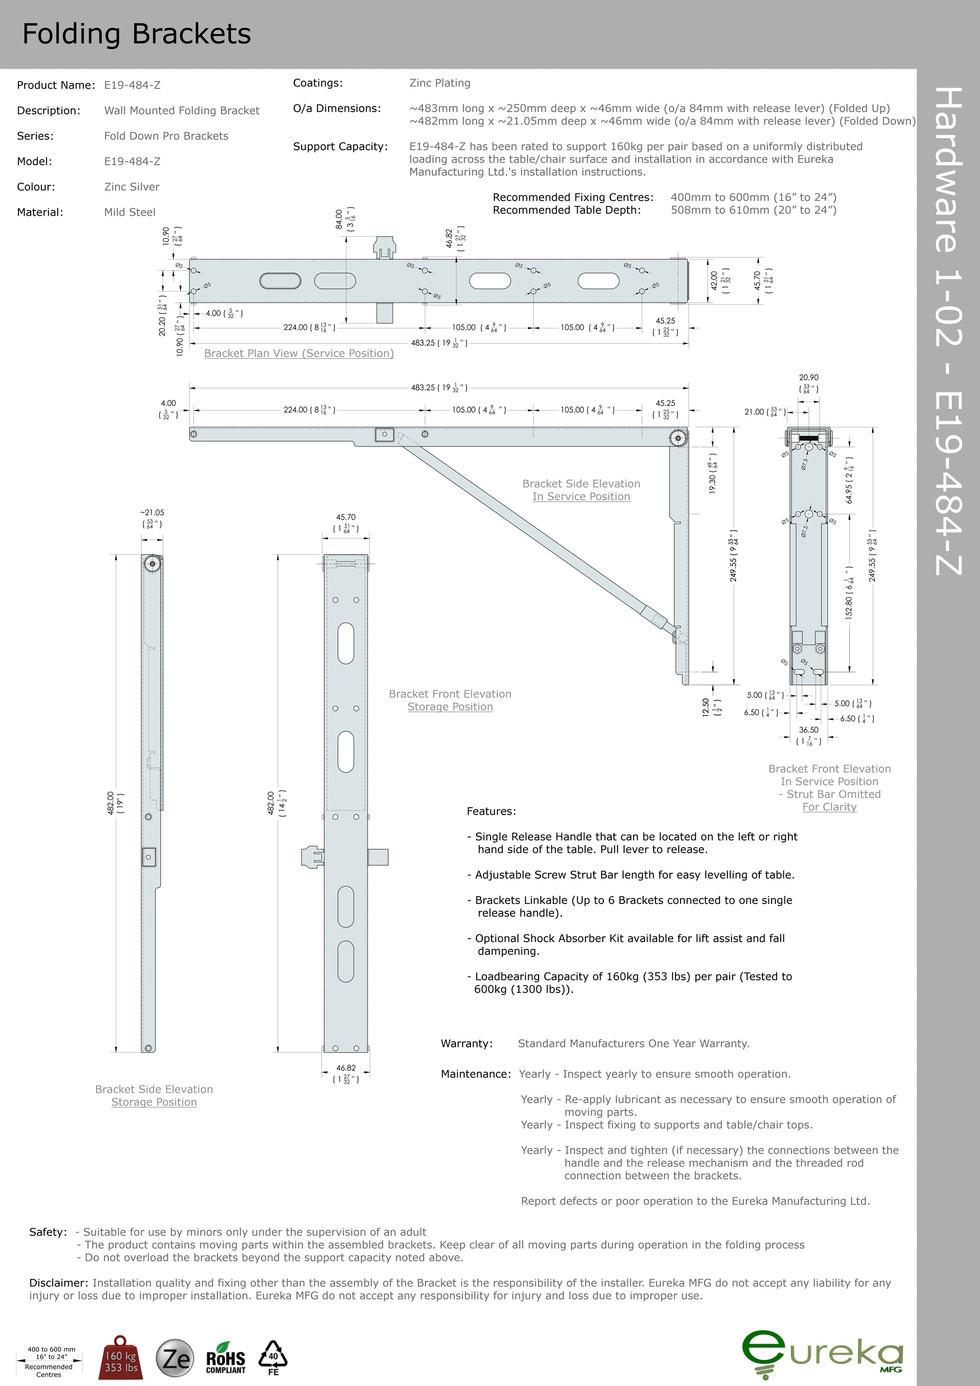 EMFG-Hardware-1-02-19-Z-Rev-A.jpg